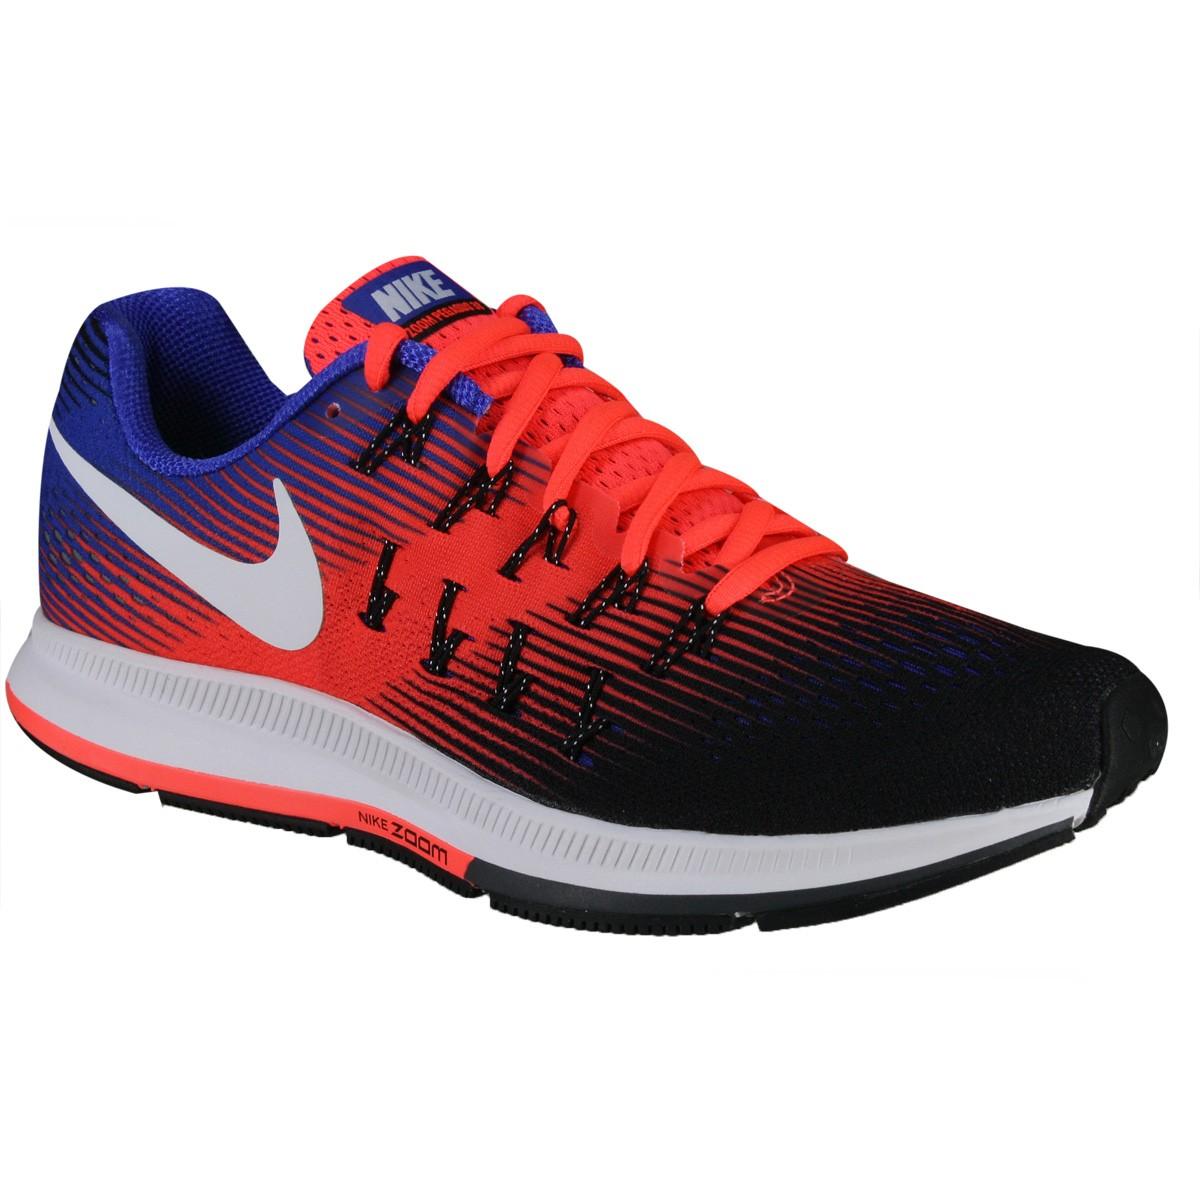 93e83bc7335 Tênis Masculino Nike Air Zoom Pegasus 33 831352-010 Preto Azul Laranja